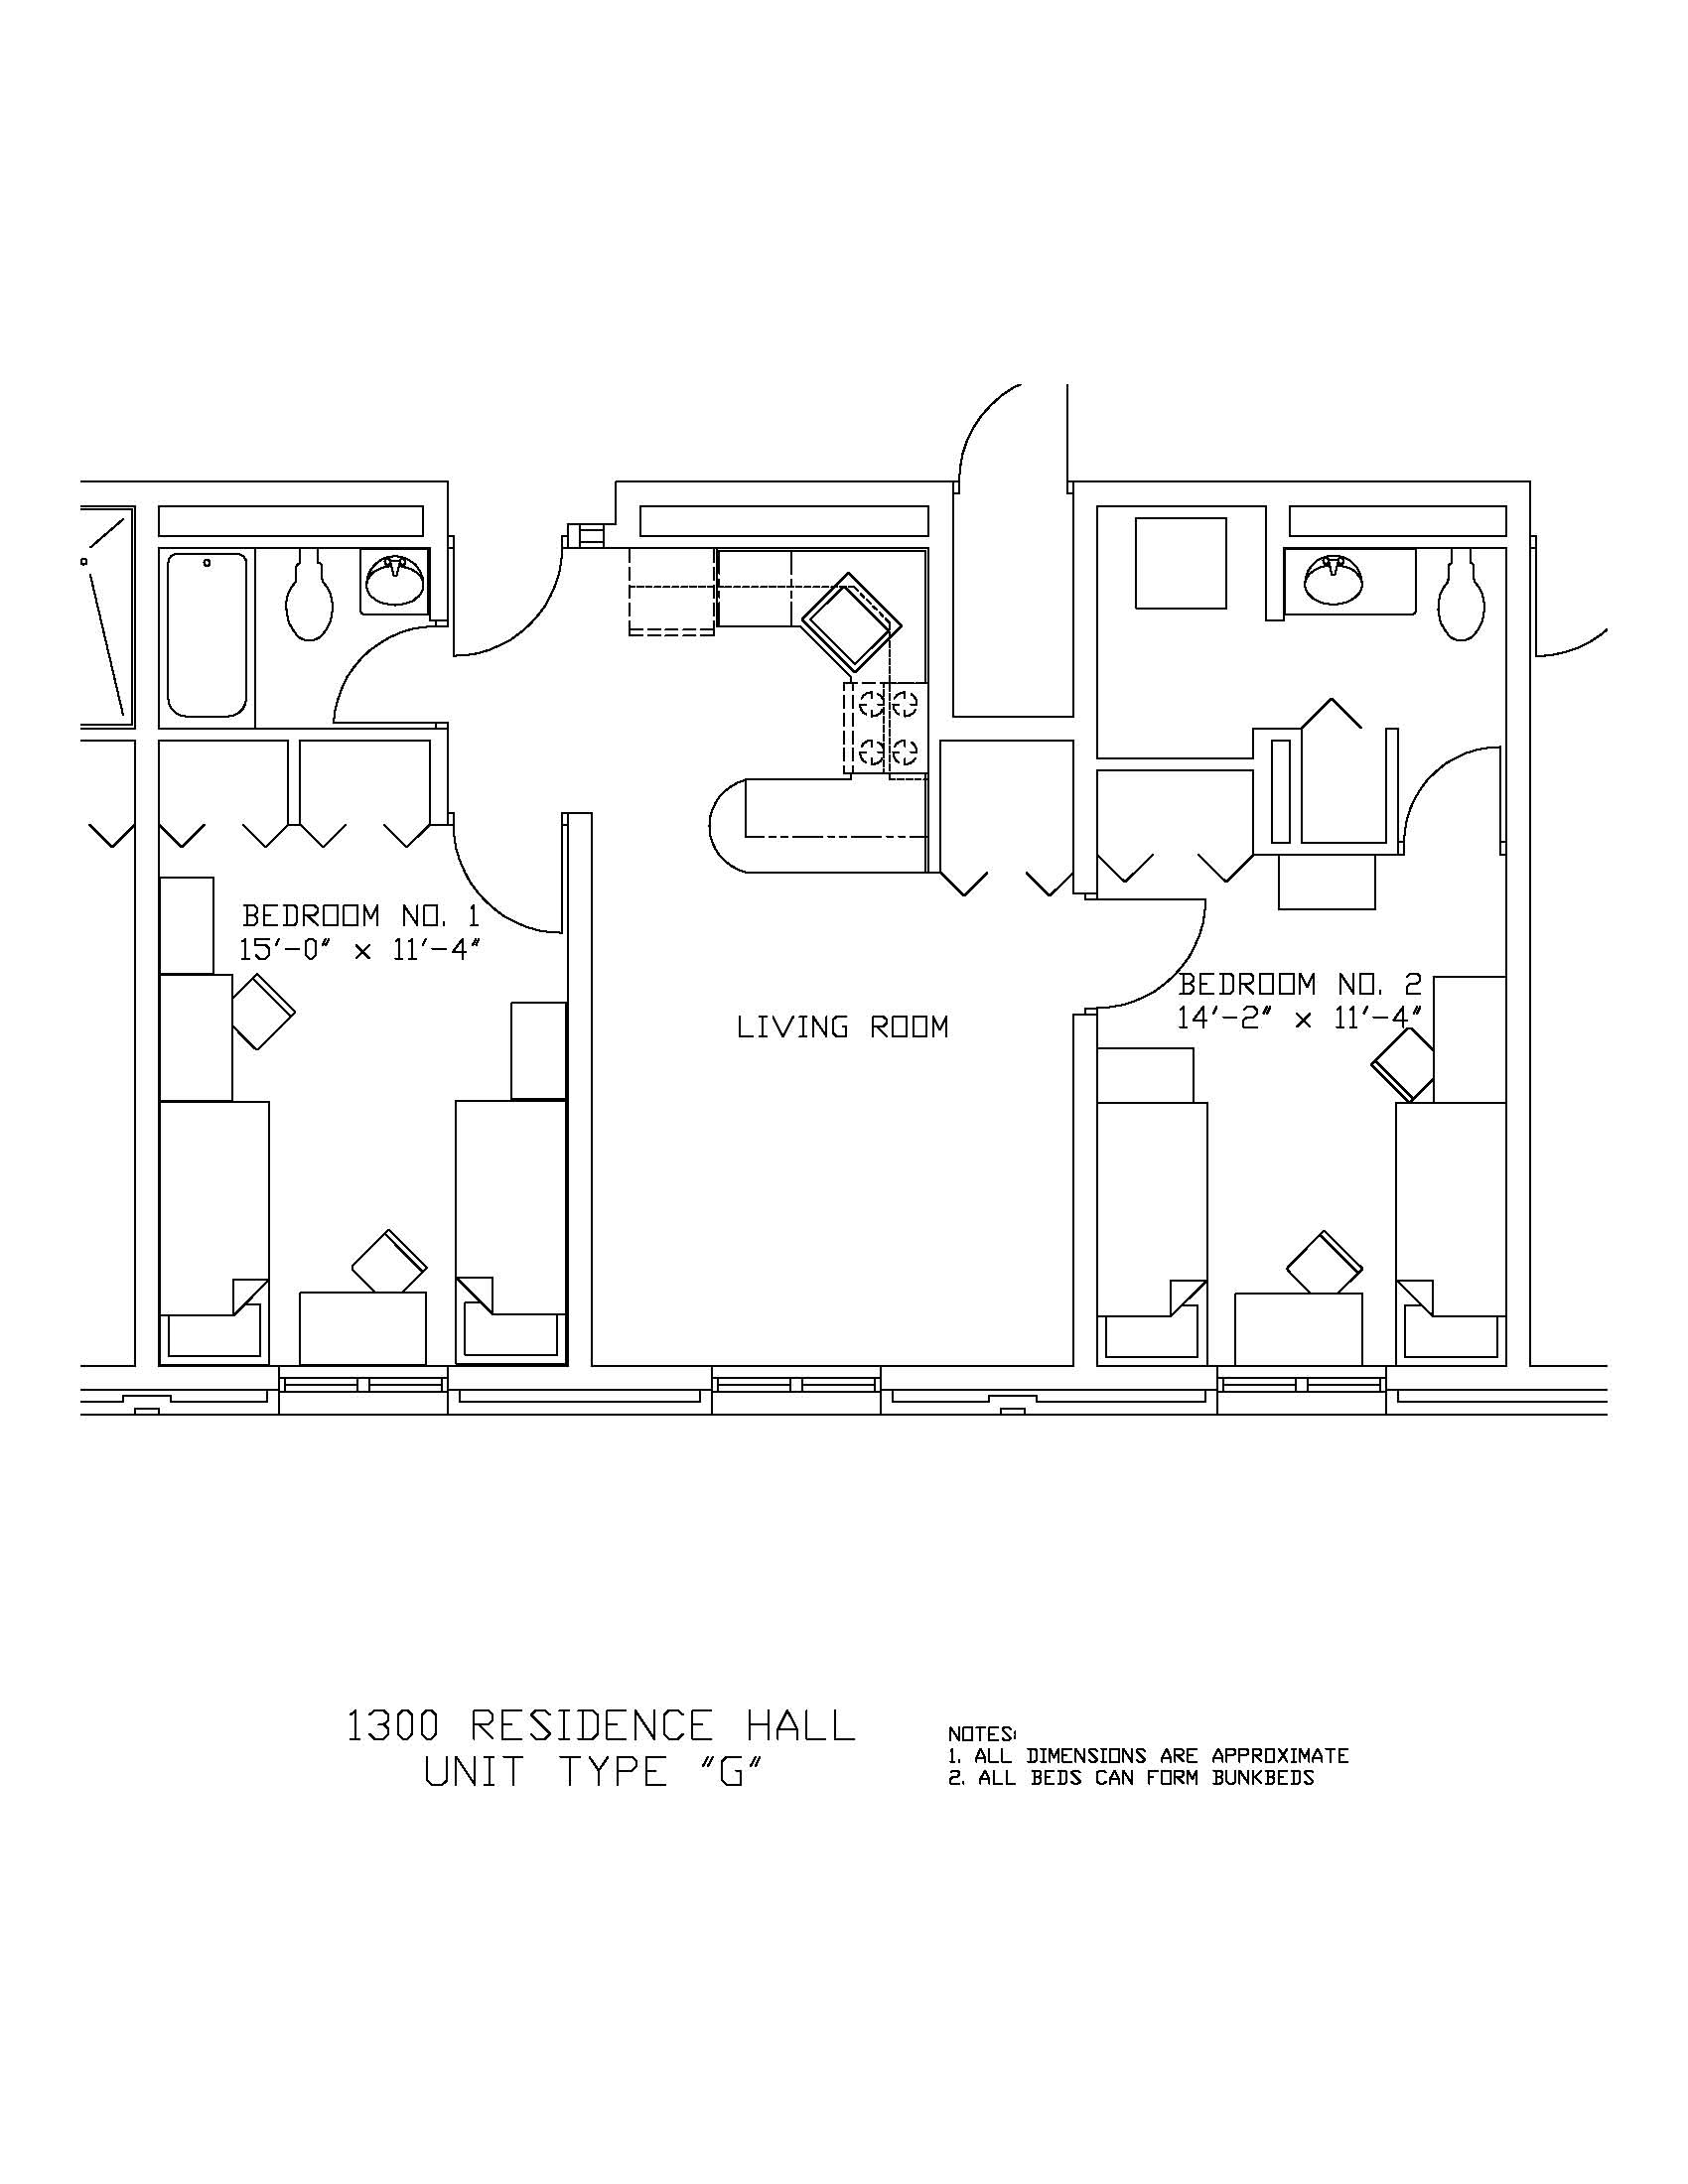 1300 Residence Hall: Type G